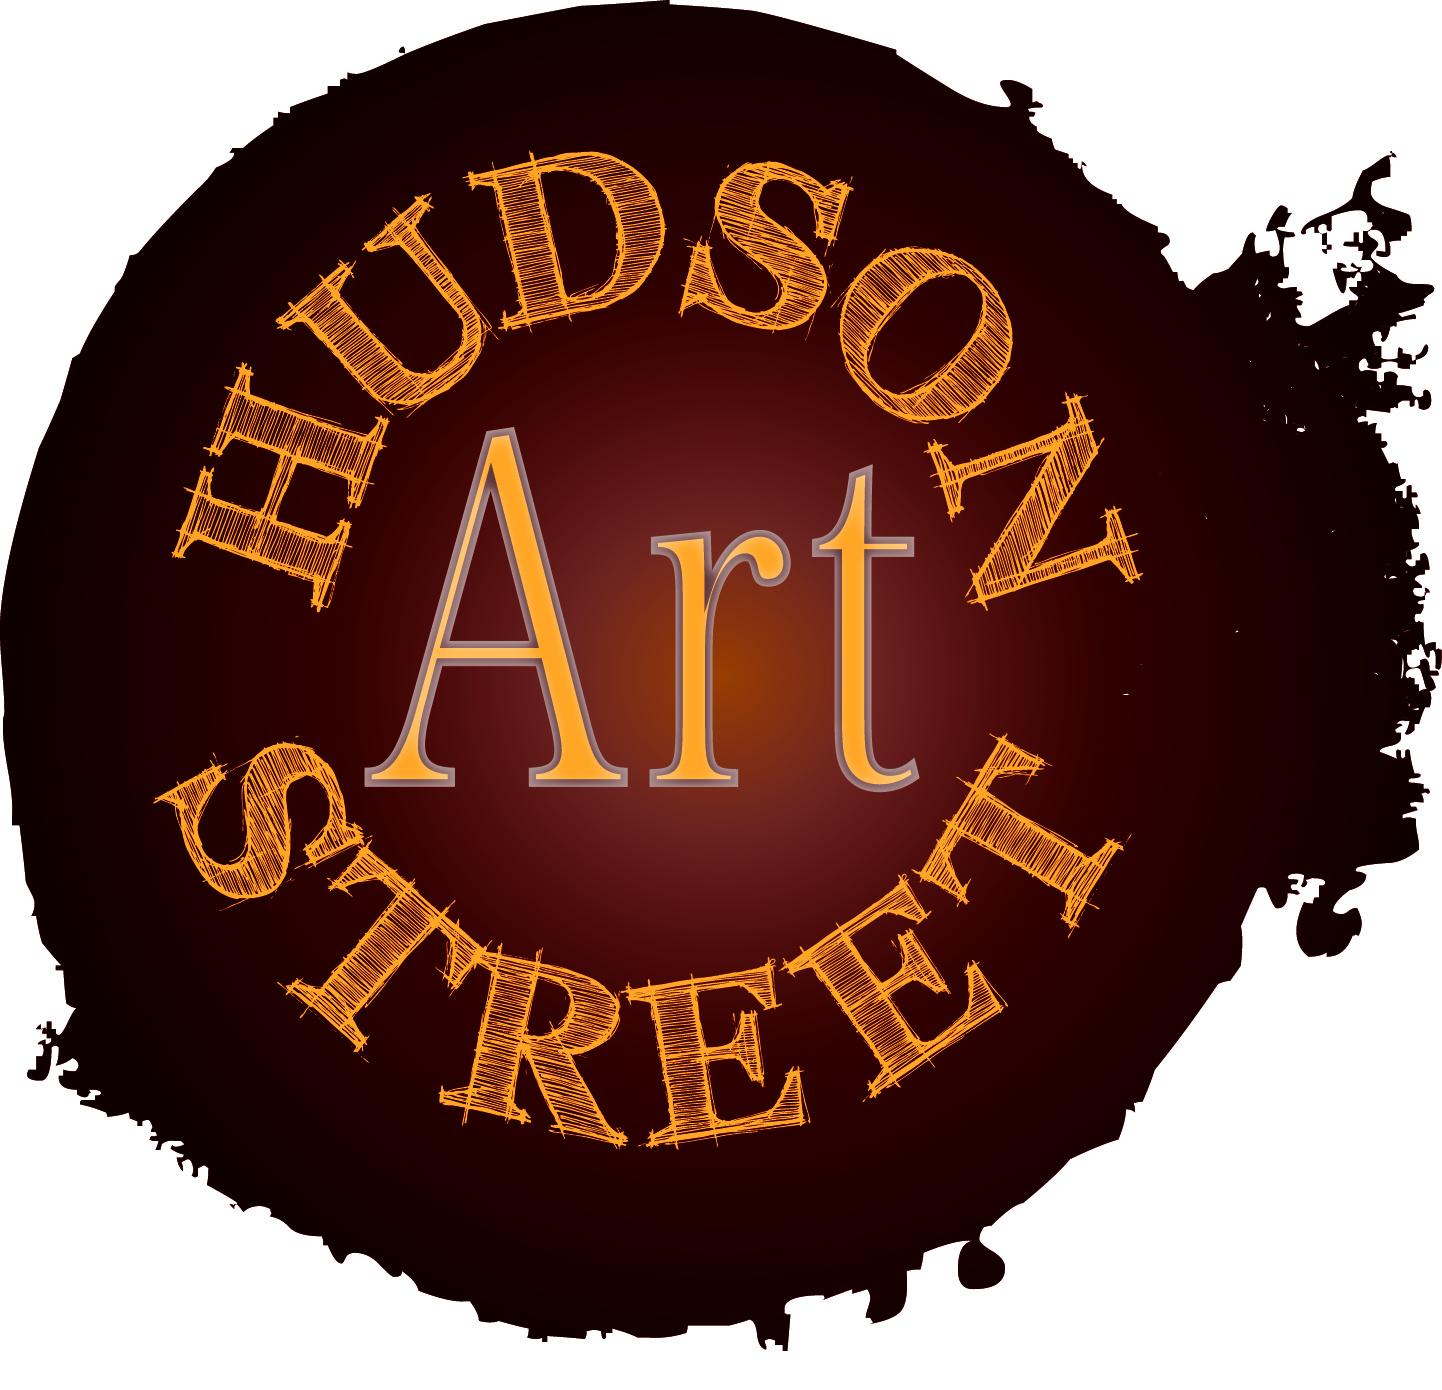 Hudson Street Art